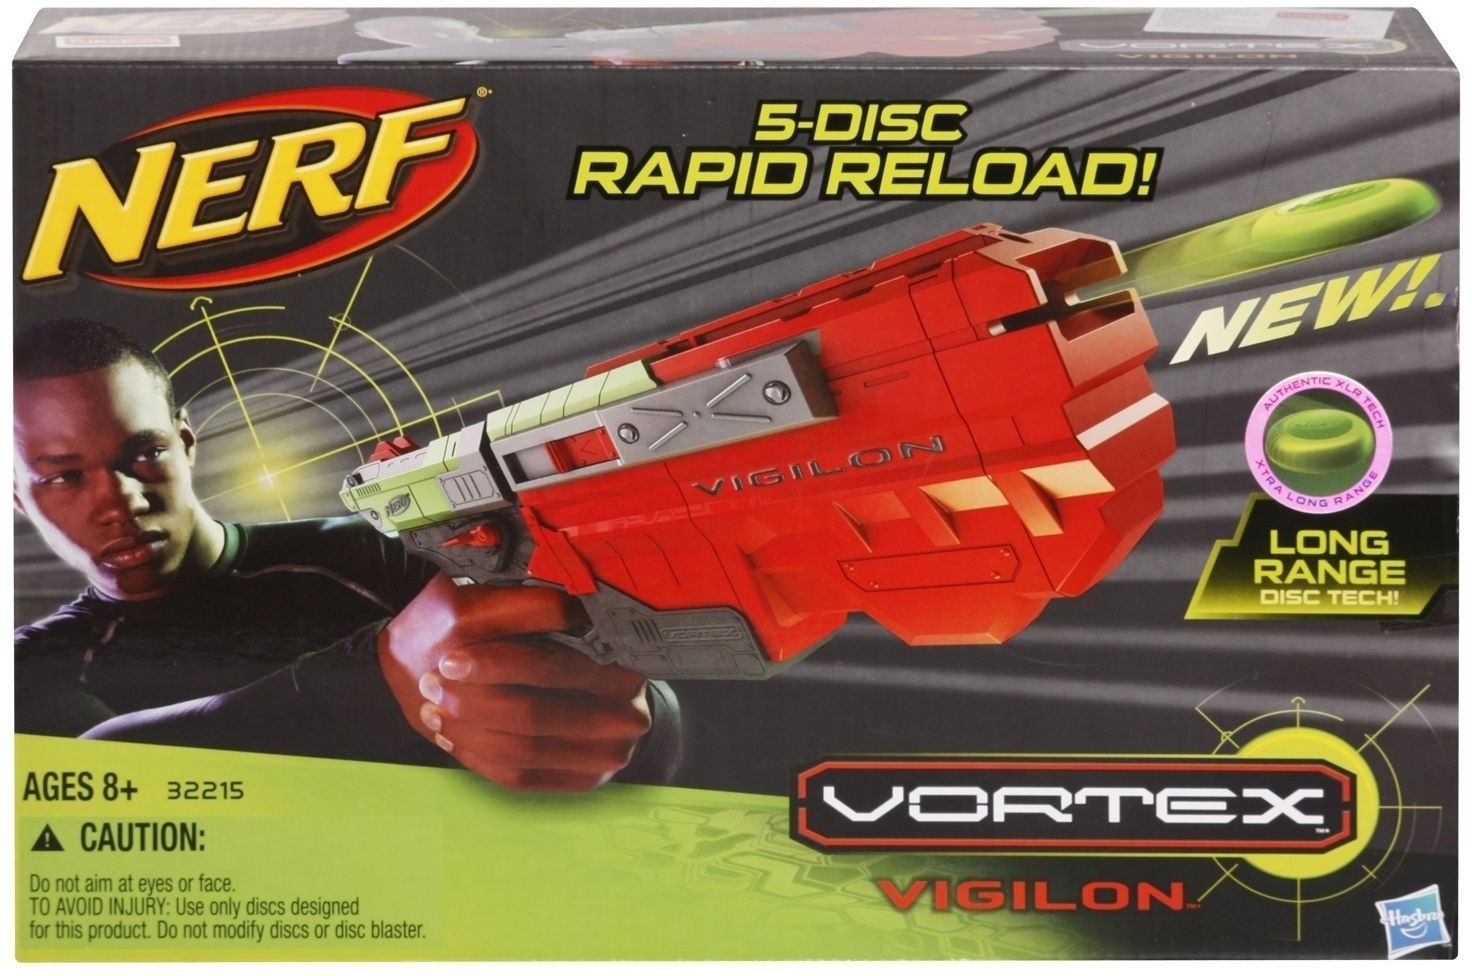 Hasbro 5-Disc Rapid Reload Disc Blaster